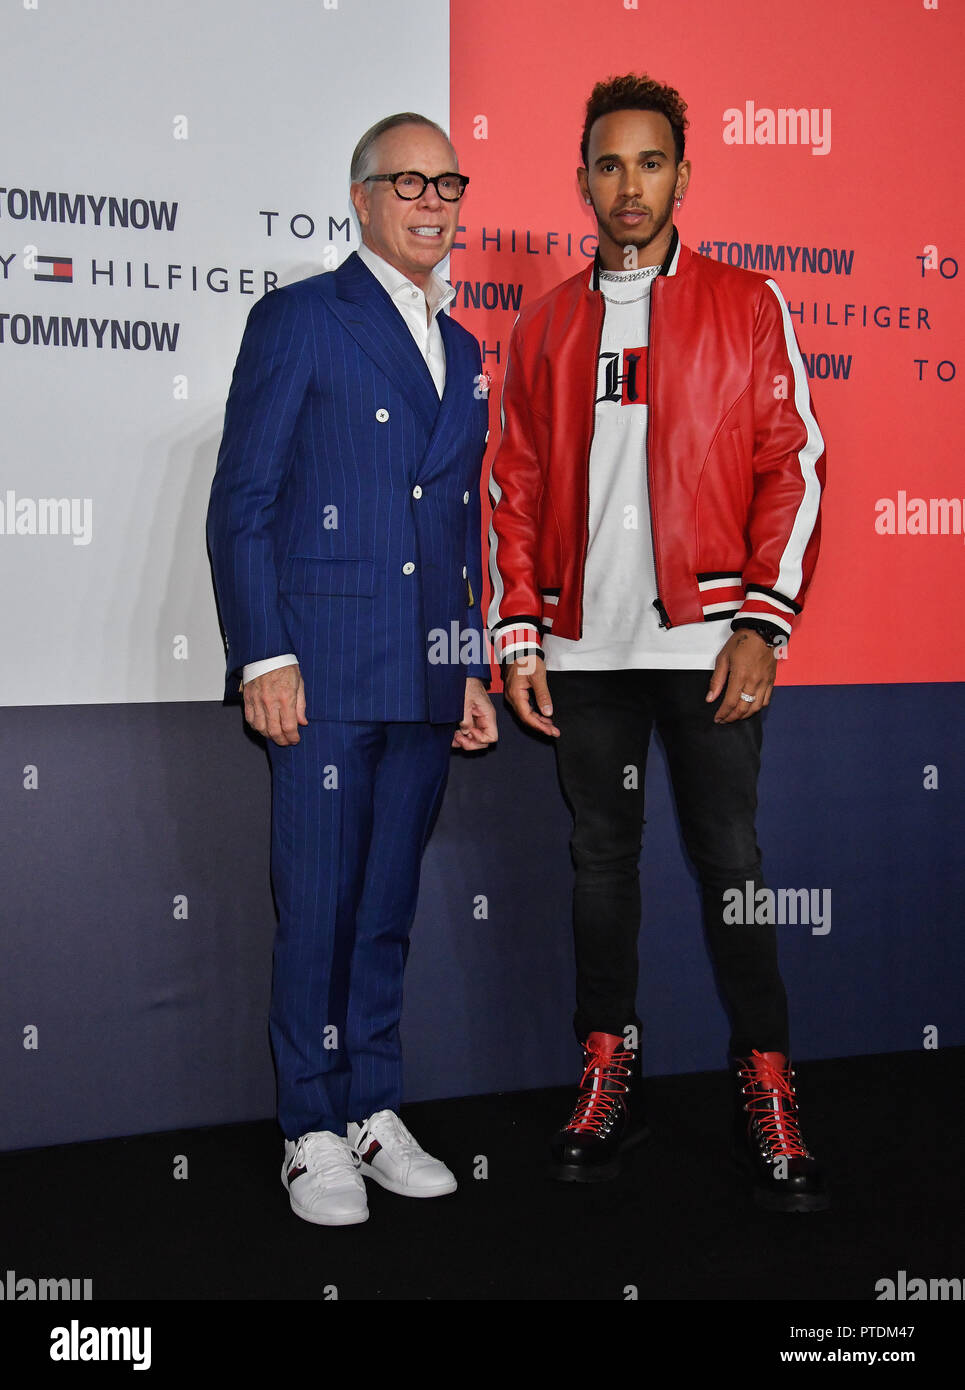 e565de96b Fashion designer Tommy Hilfiger(L) and racing driver Lewis Hamilton attend  the event